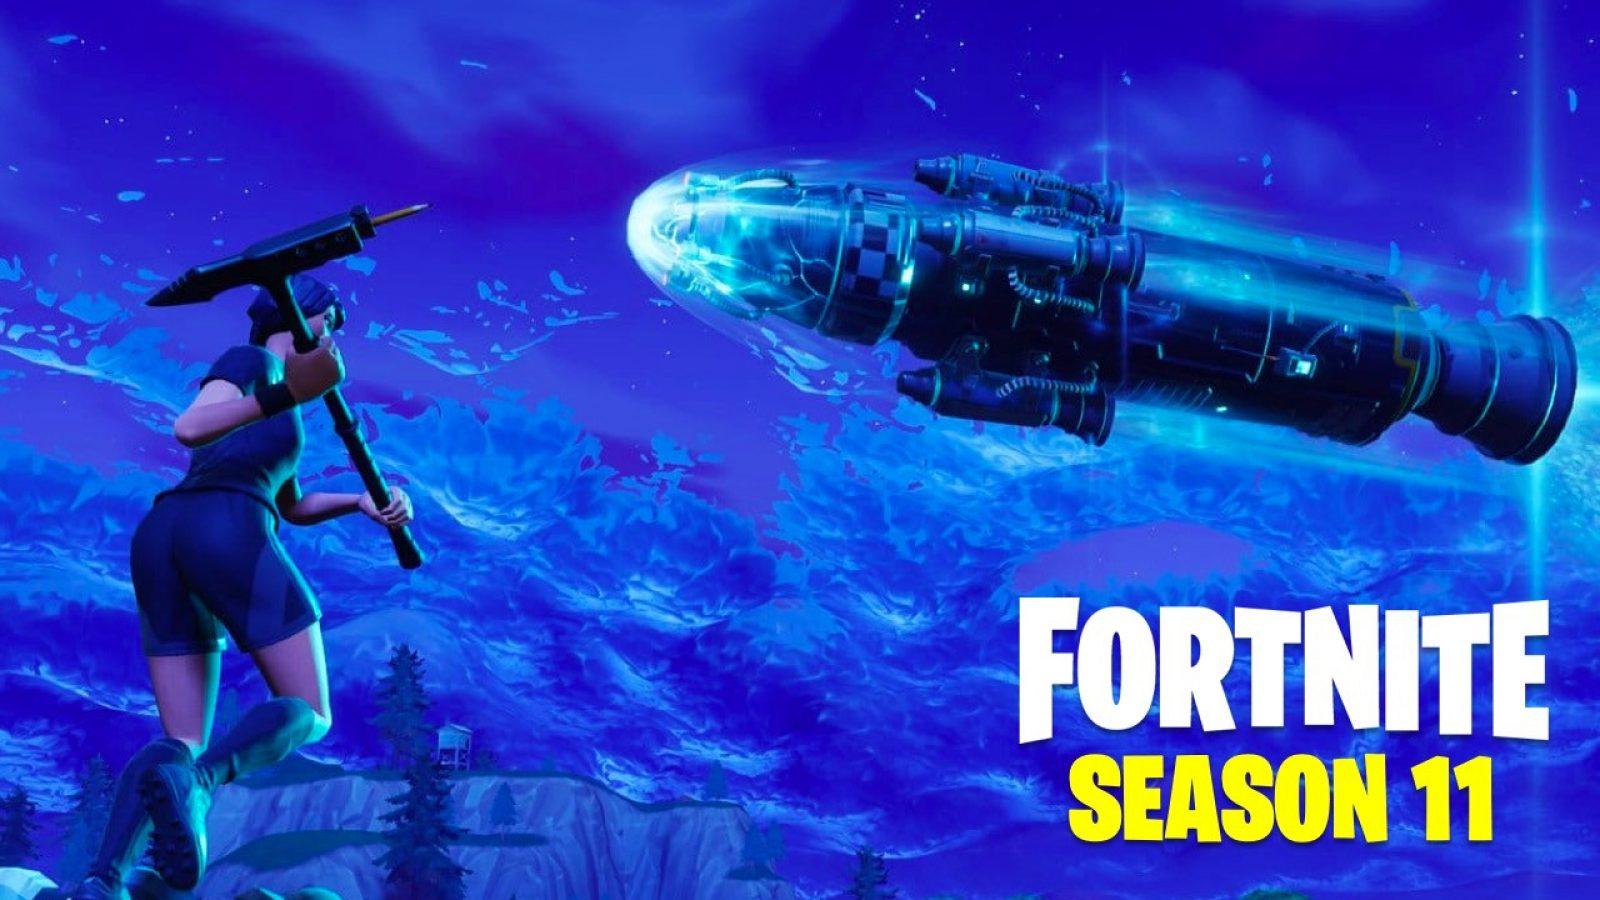 UPDATE Fortnite Season 11 Epic Plays Ultimate Black Hole Prank 1600x900